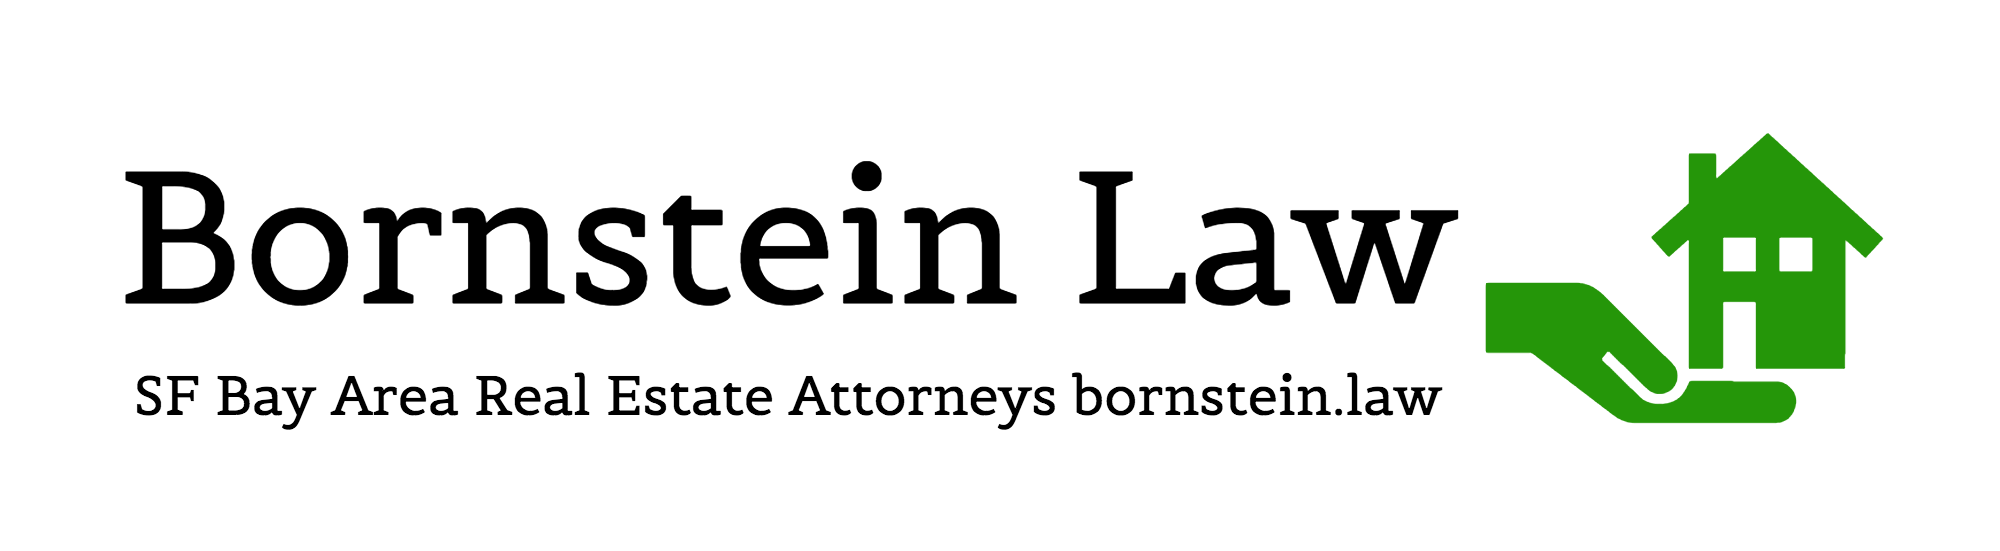 Bornstein Law-logo(1).png